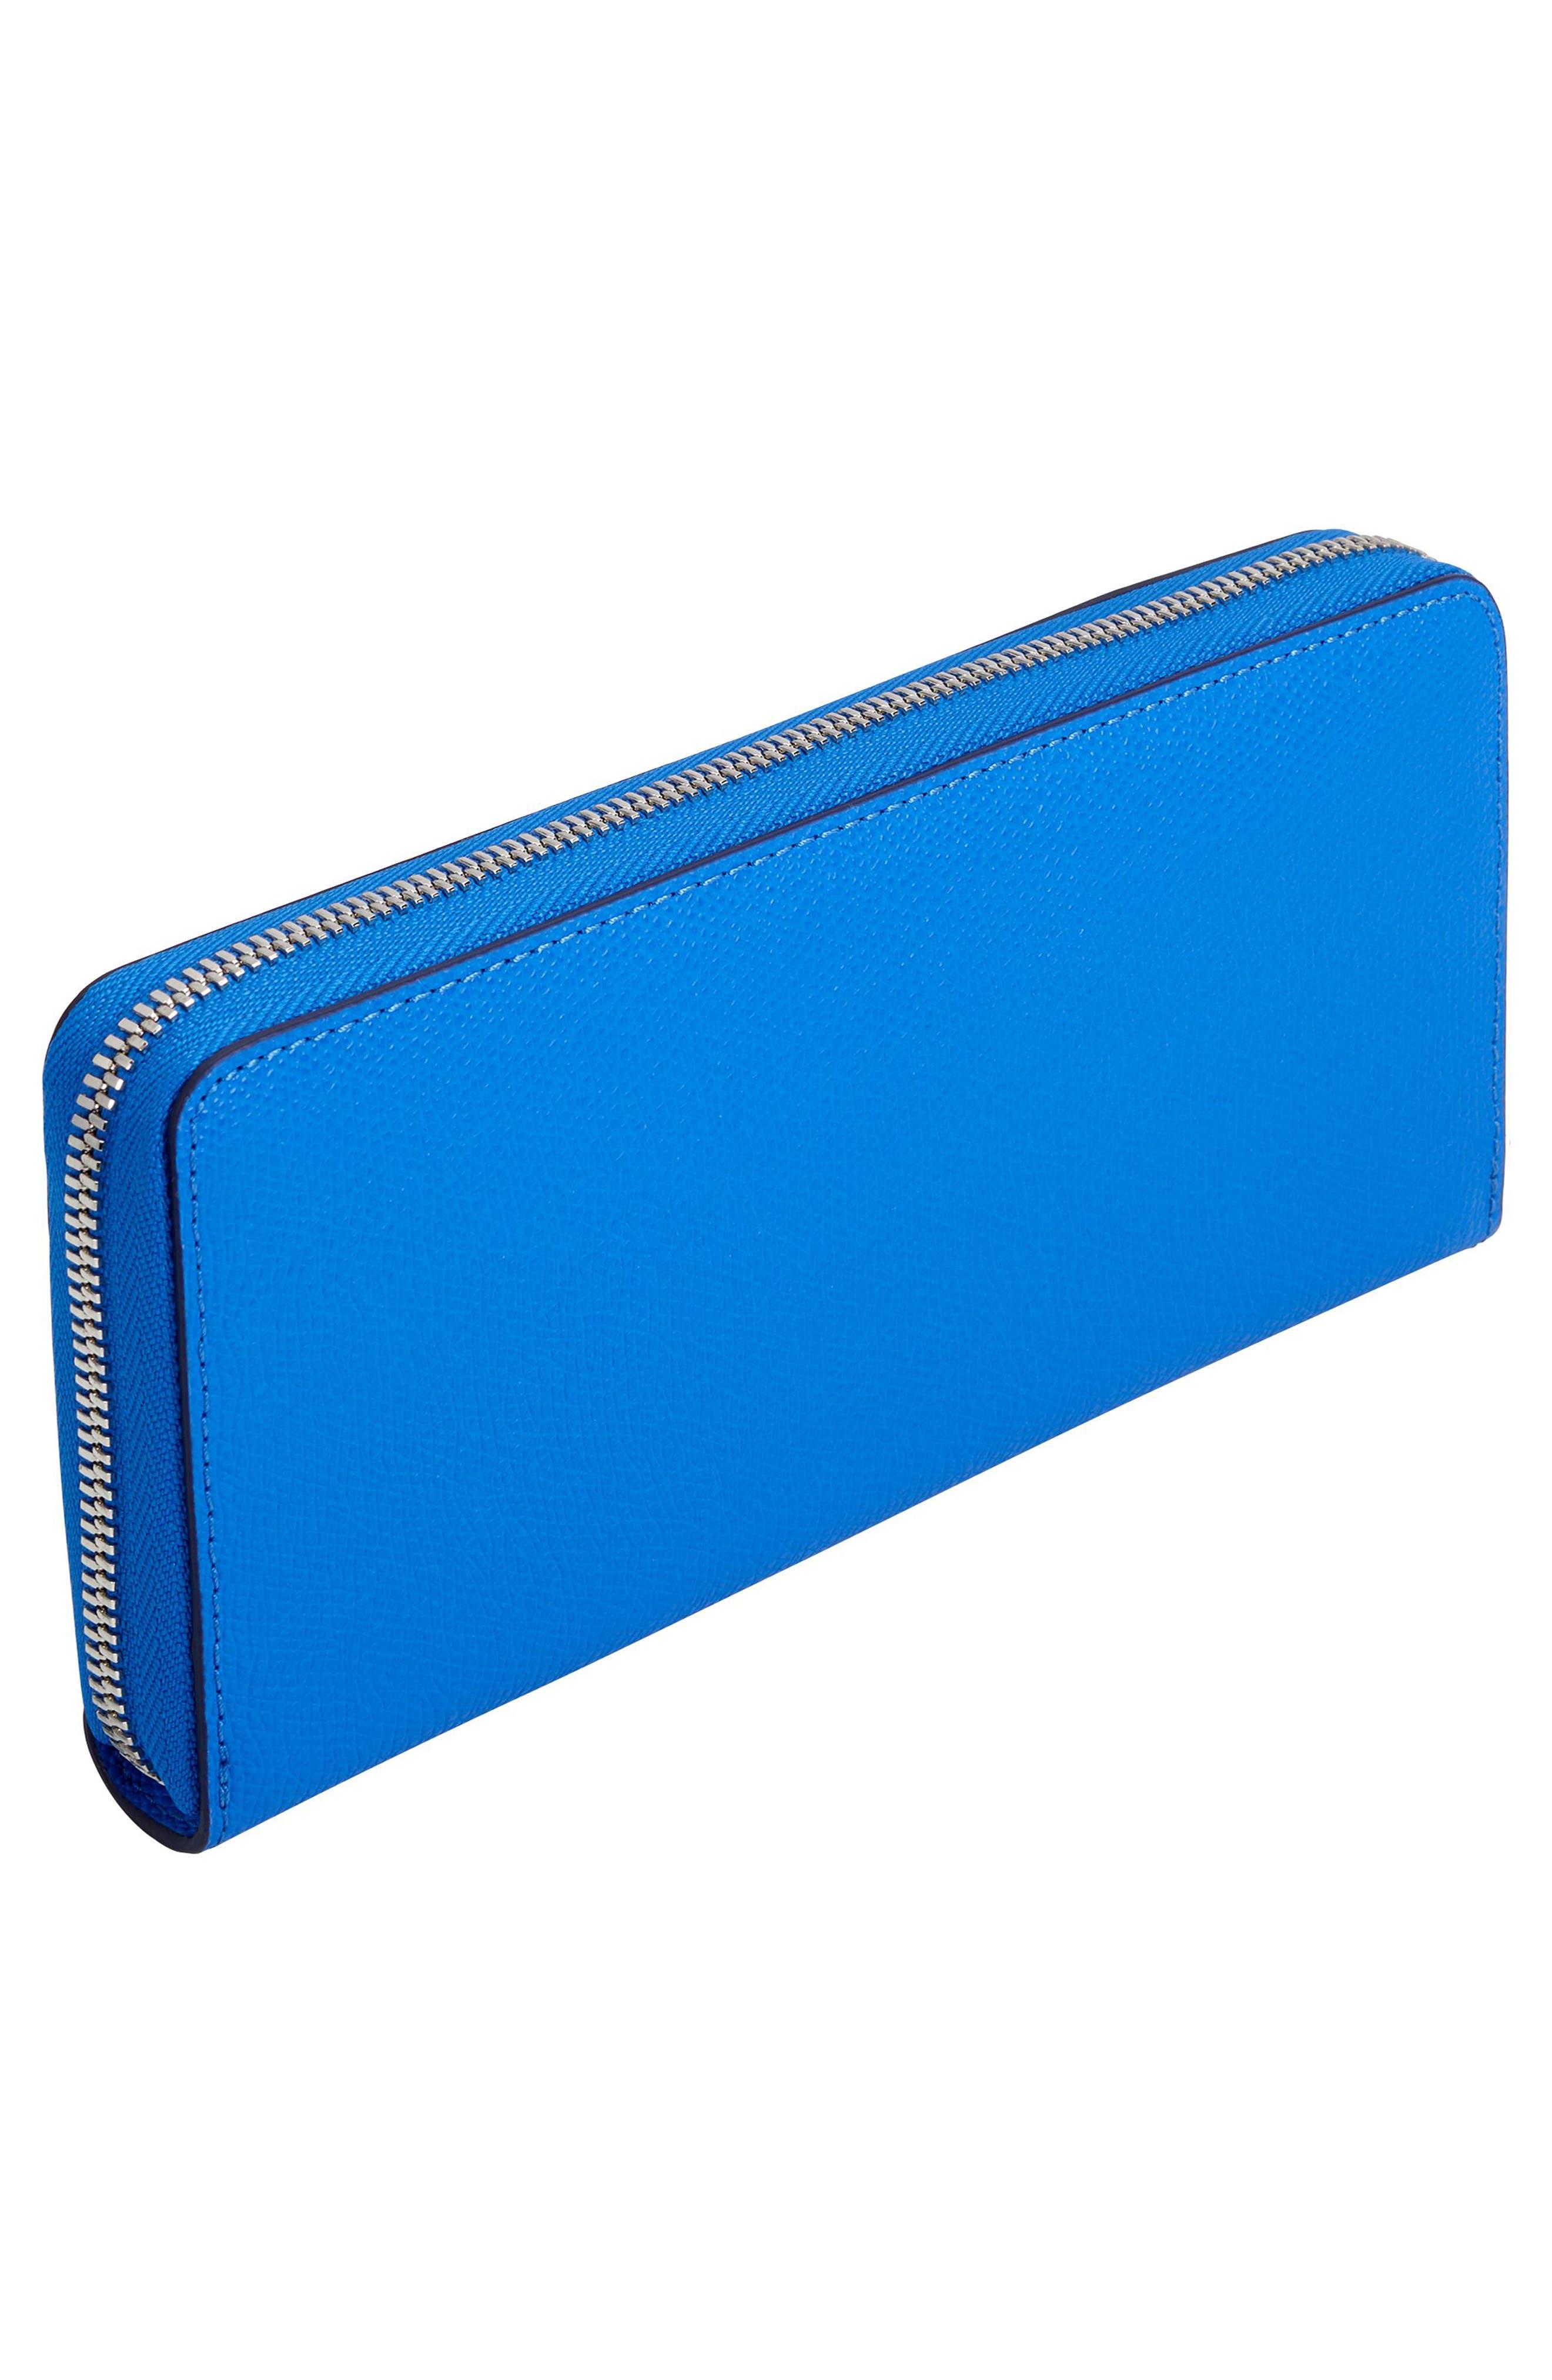 Continental Tech Wallet,                             Alternate thumbnail 7, color,